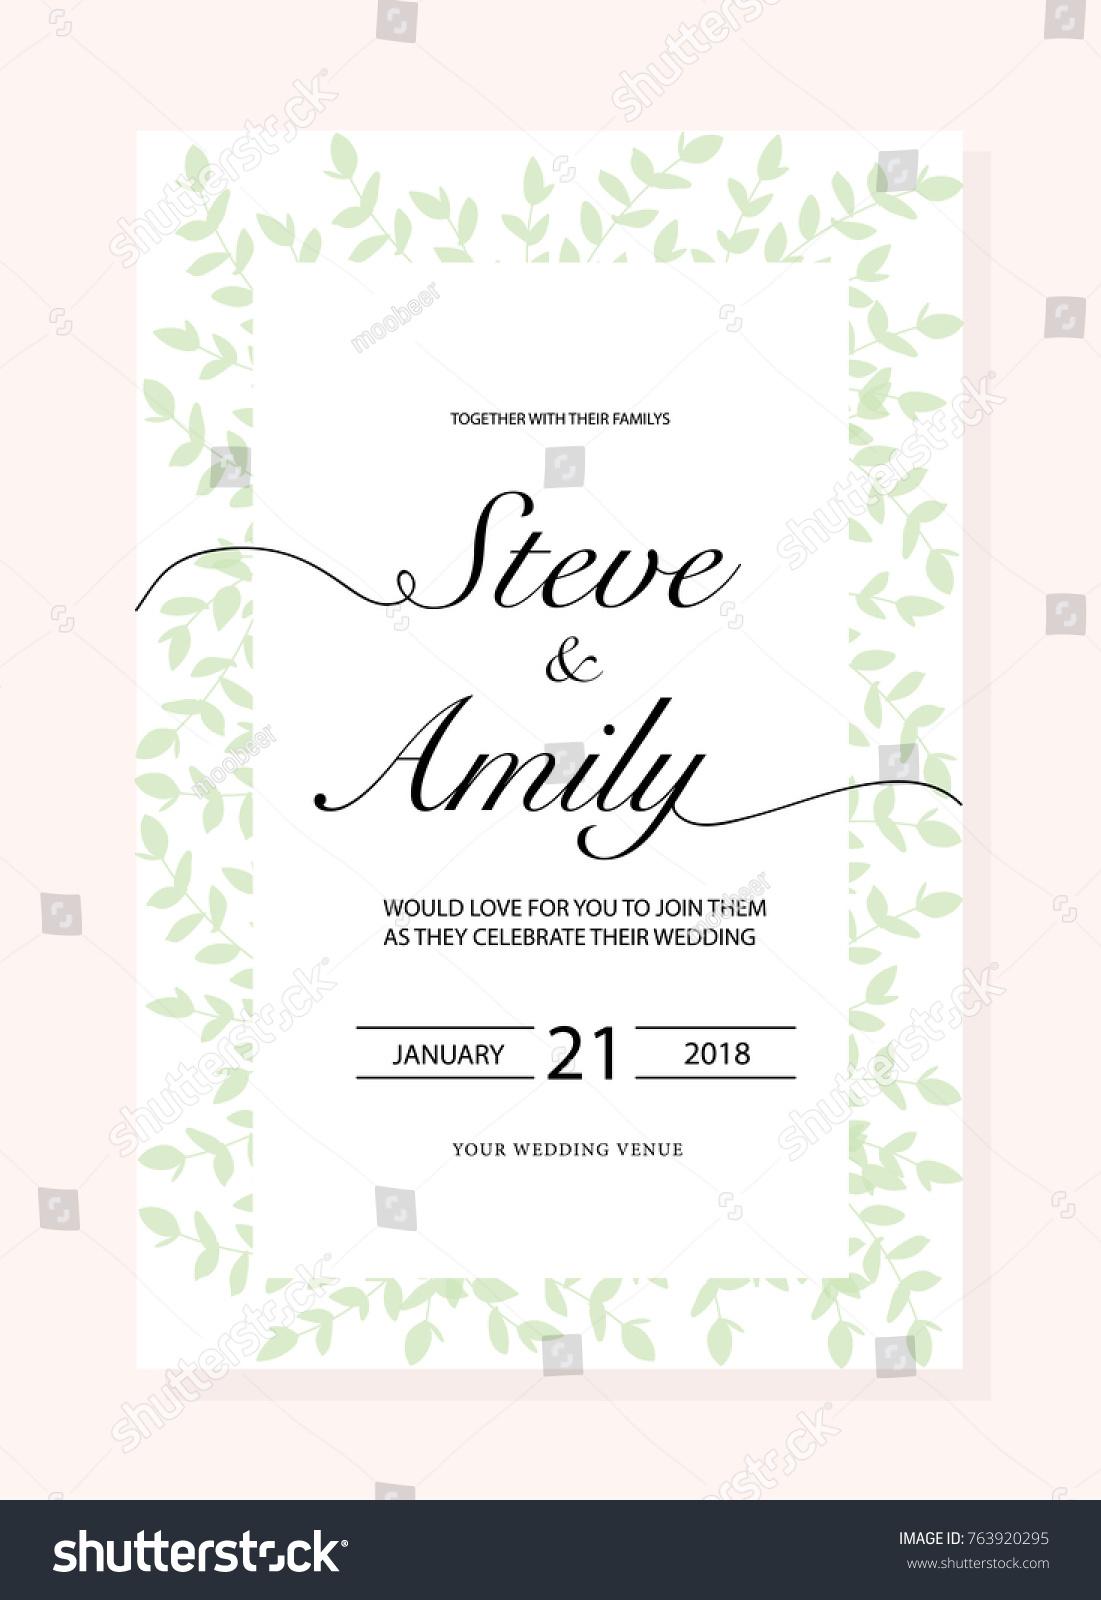 Green Wedding Invitation Card Stock Photo (Photo, Vector ...